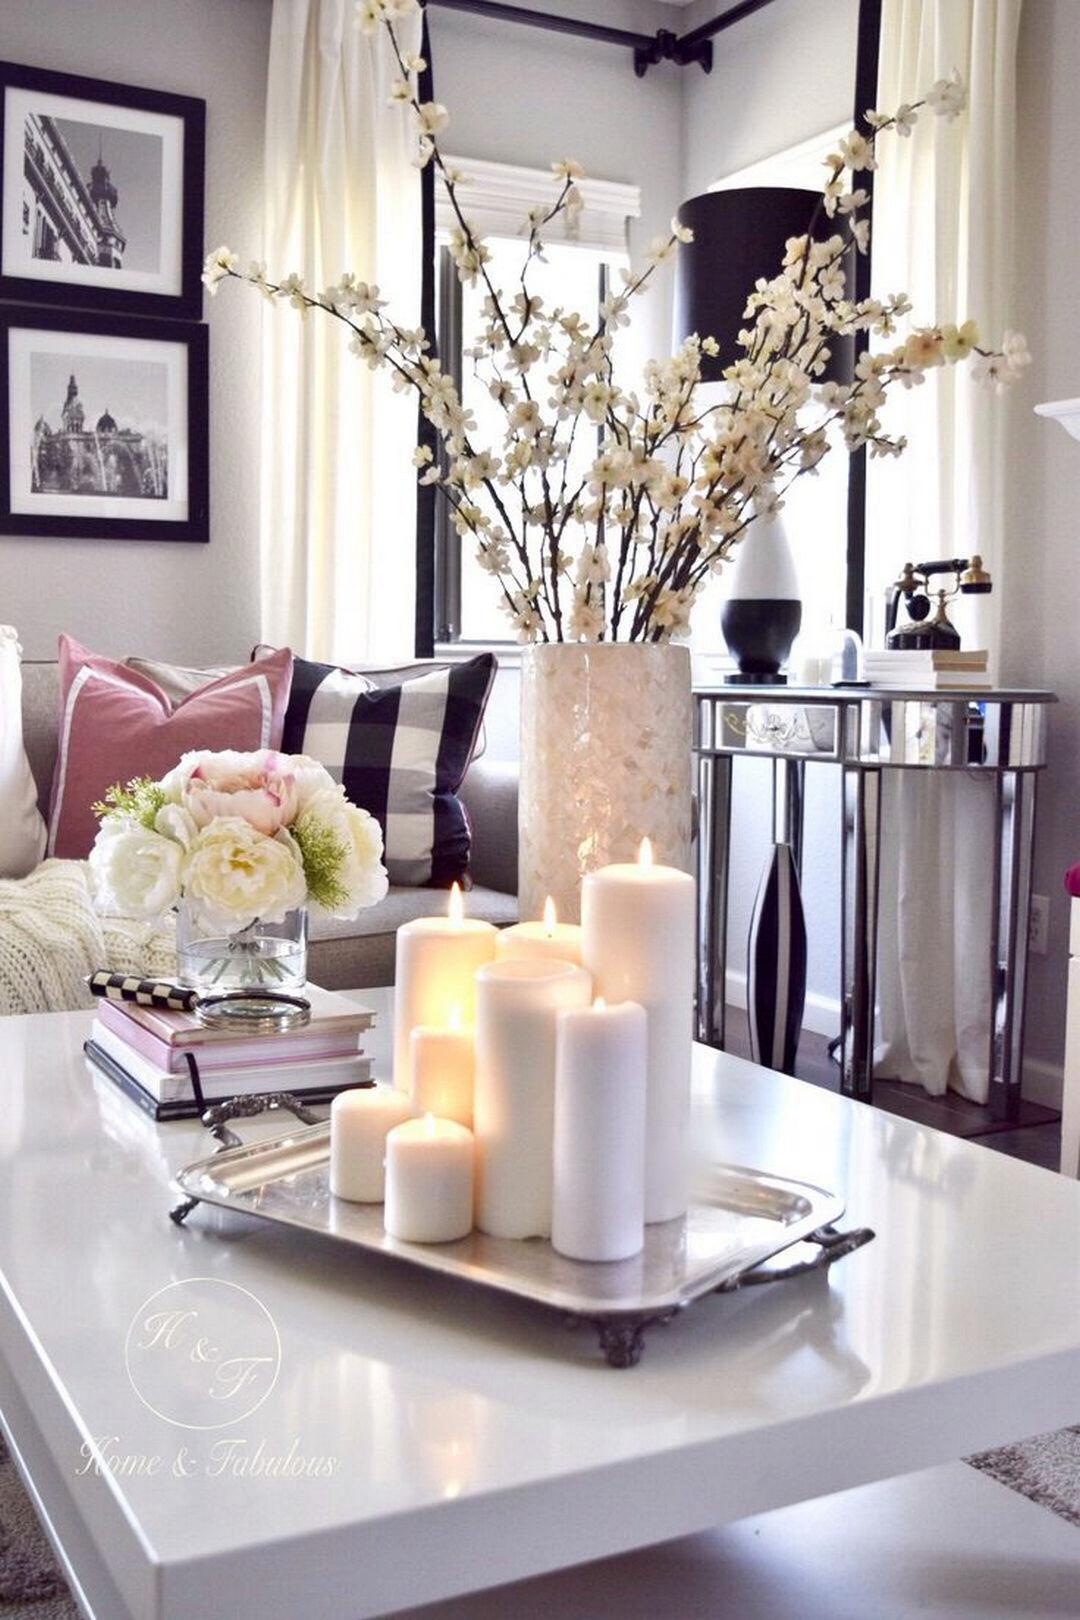 Modern Design Table Decor Living Room Coffe Table Decor Coffee Table Decor Tray [ 1083 x 736 Pixel ]